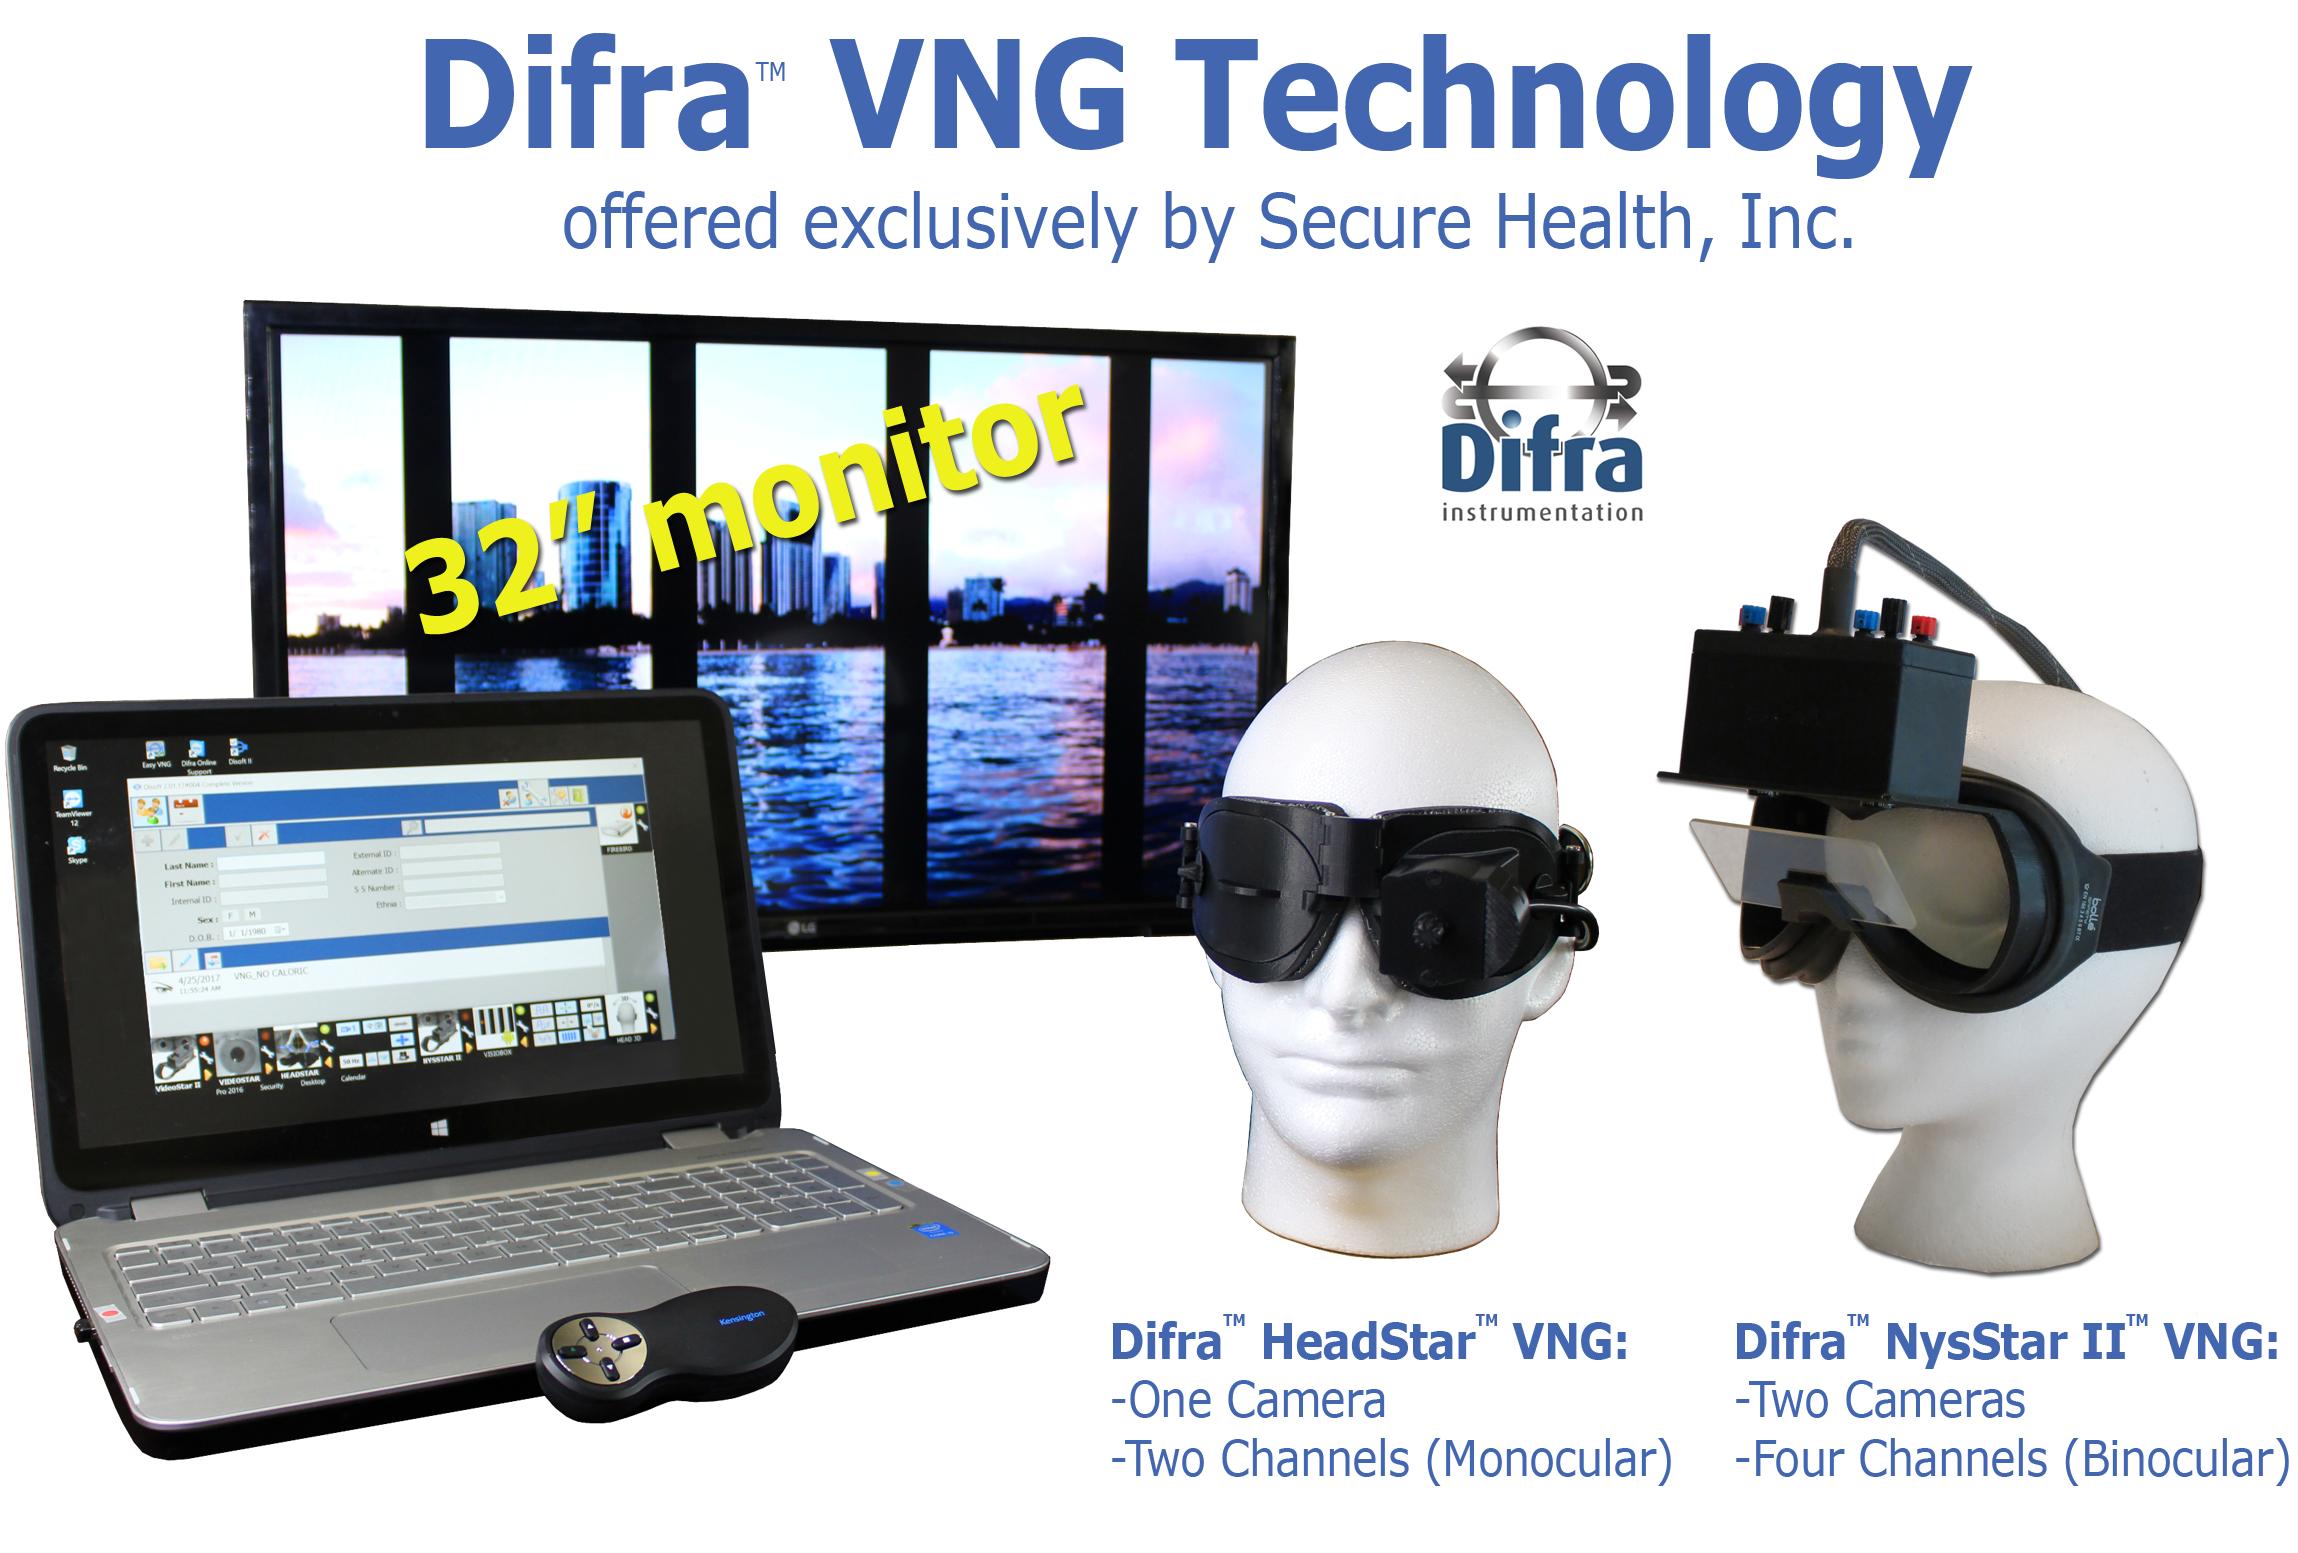 Difra, VNG, premium technology, monocular, binocular, videonystagmography systems